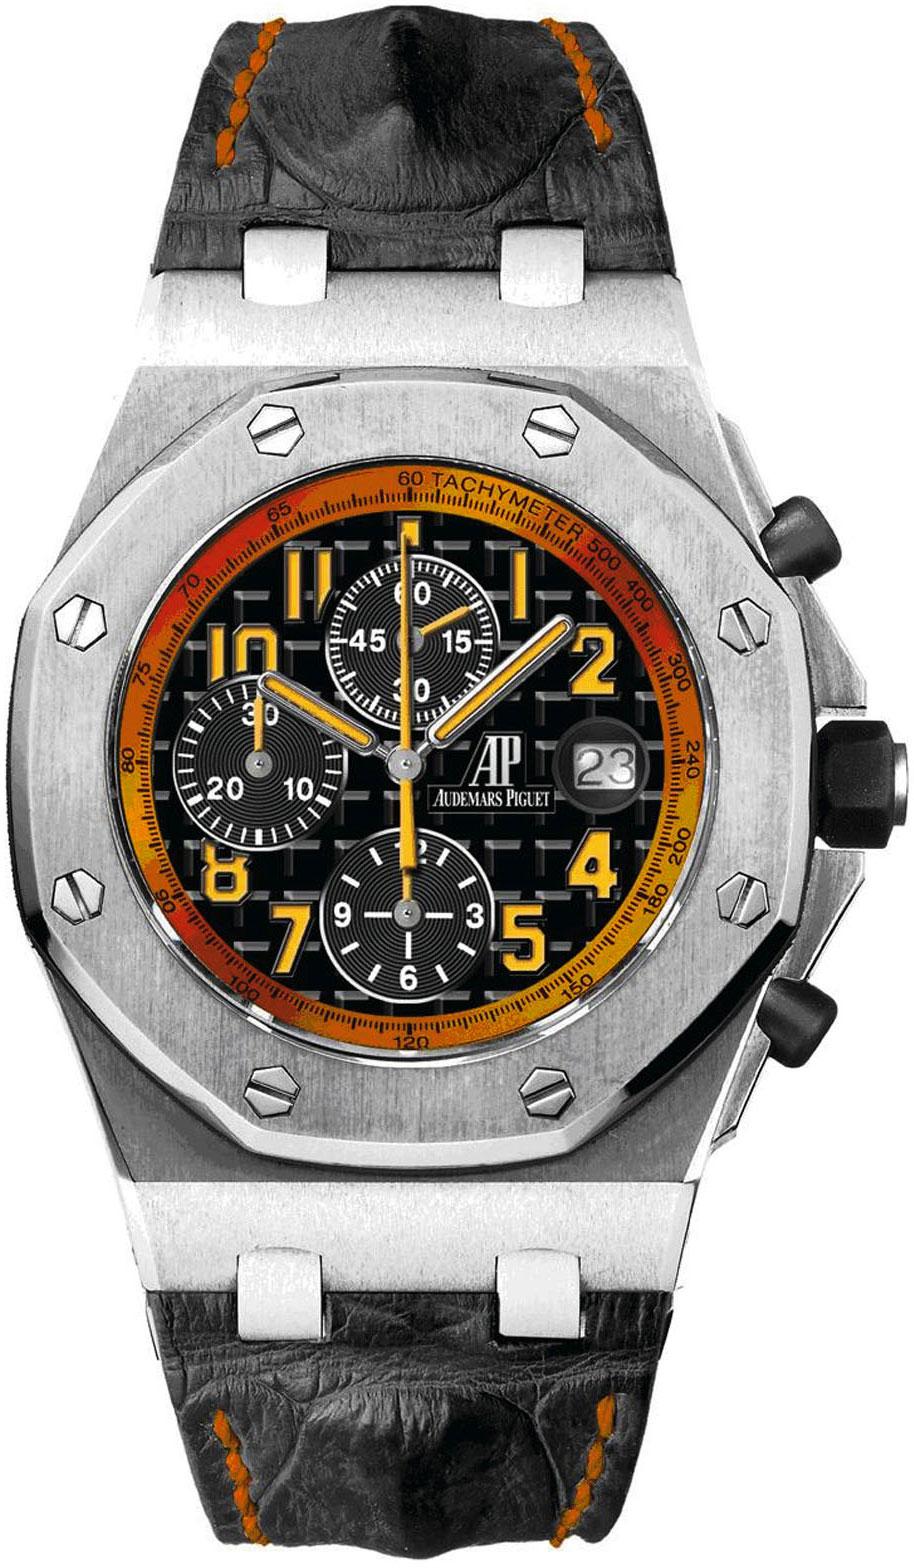 Audemars piguet royal oak offshore volcano men 39 s watch for Audemars piguet costo